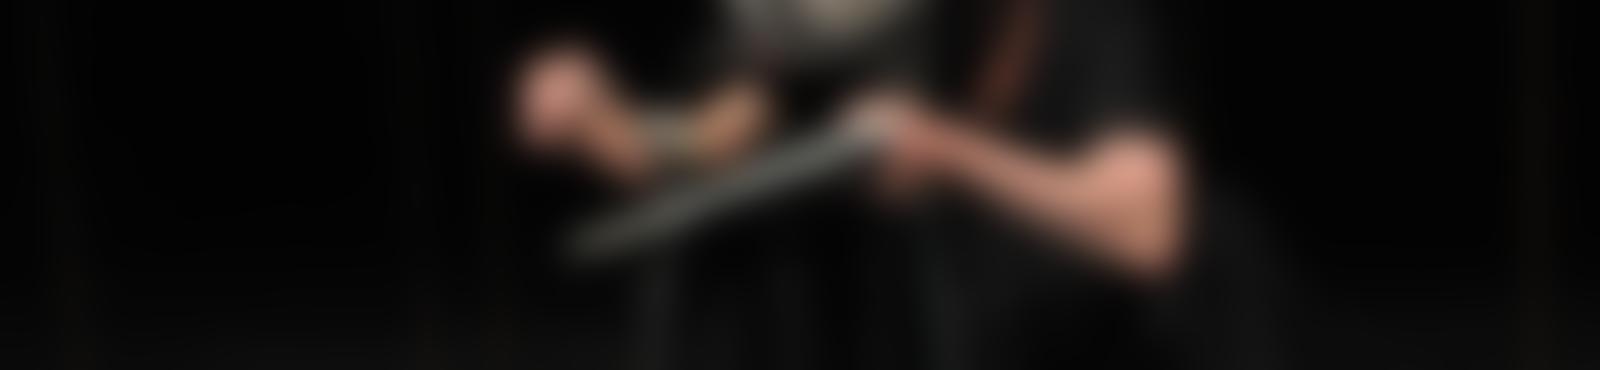 Blurred b9706d8a 3aec 48fe 9116 8b42471539cc